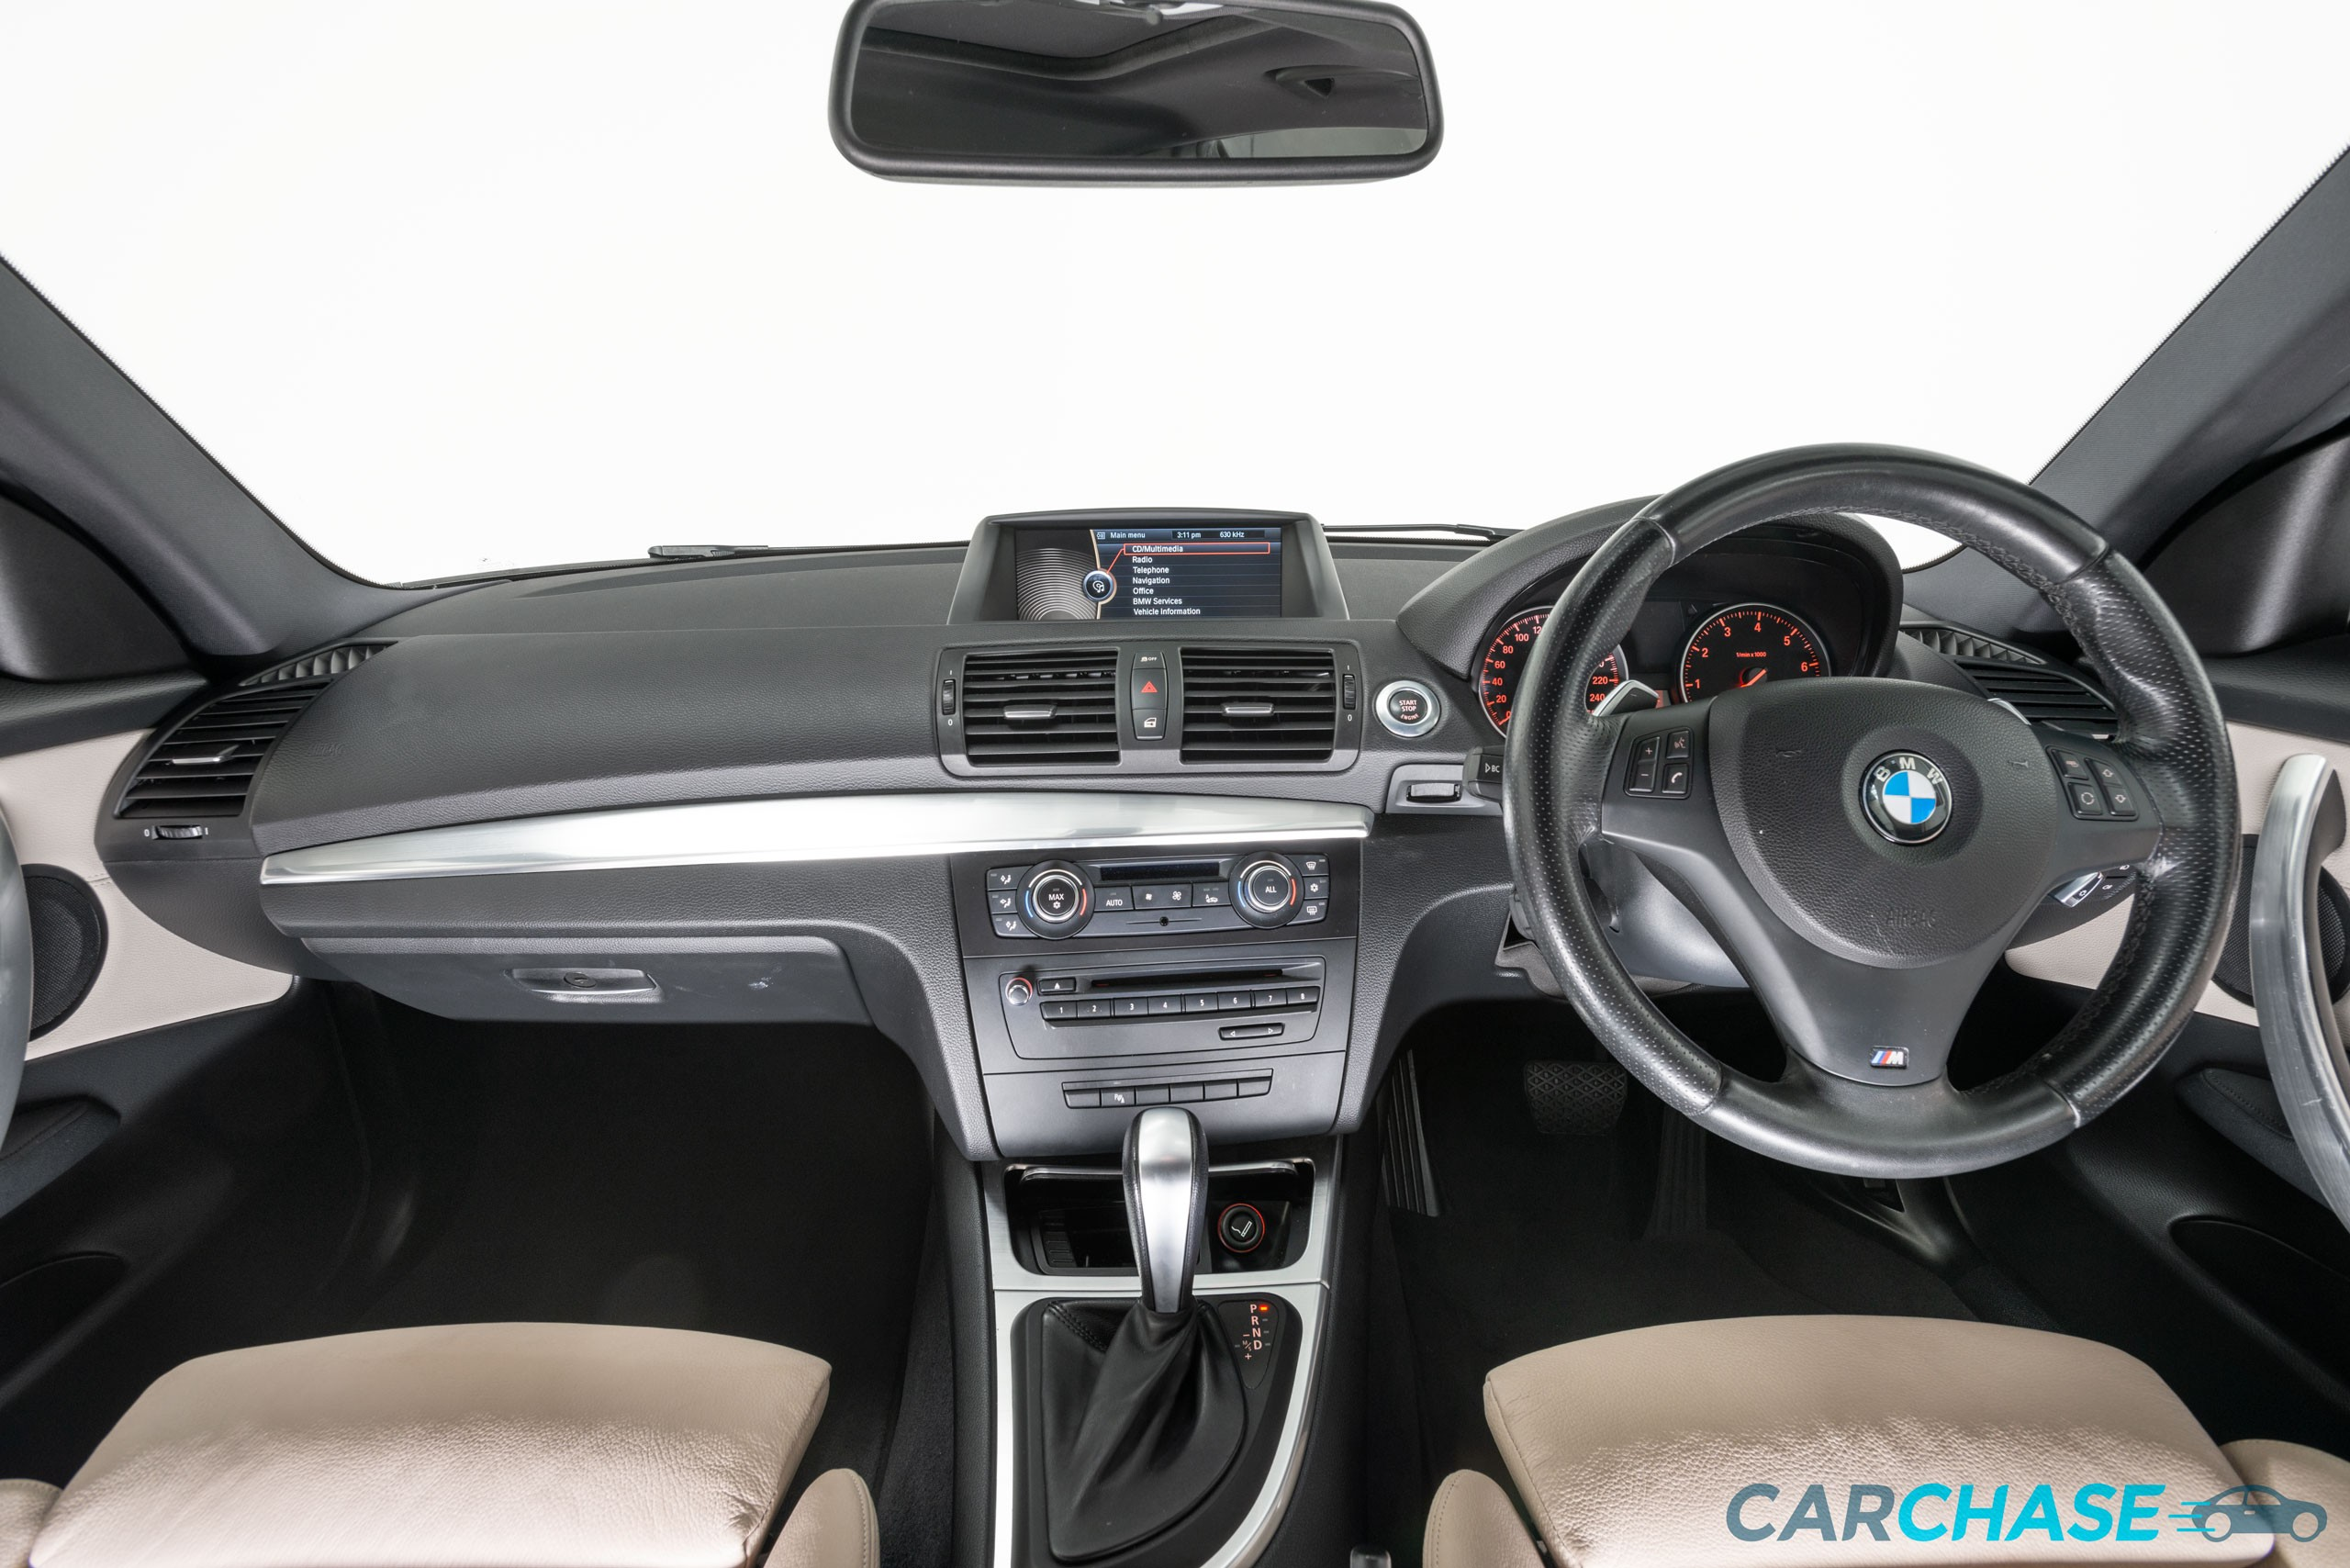 Image of dashboard profile of 2011 BMW 125i